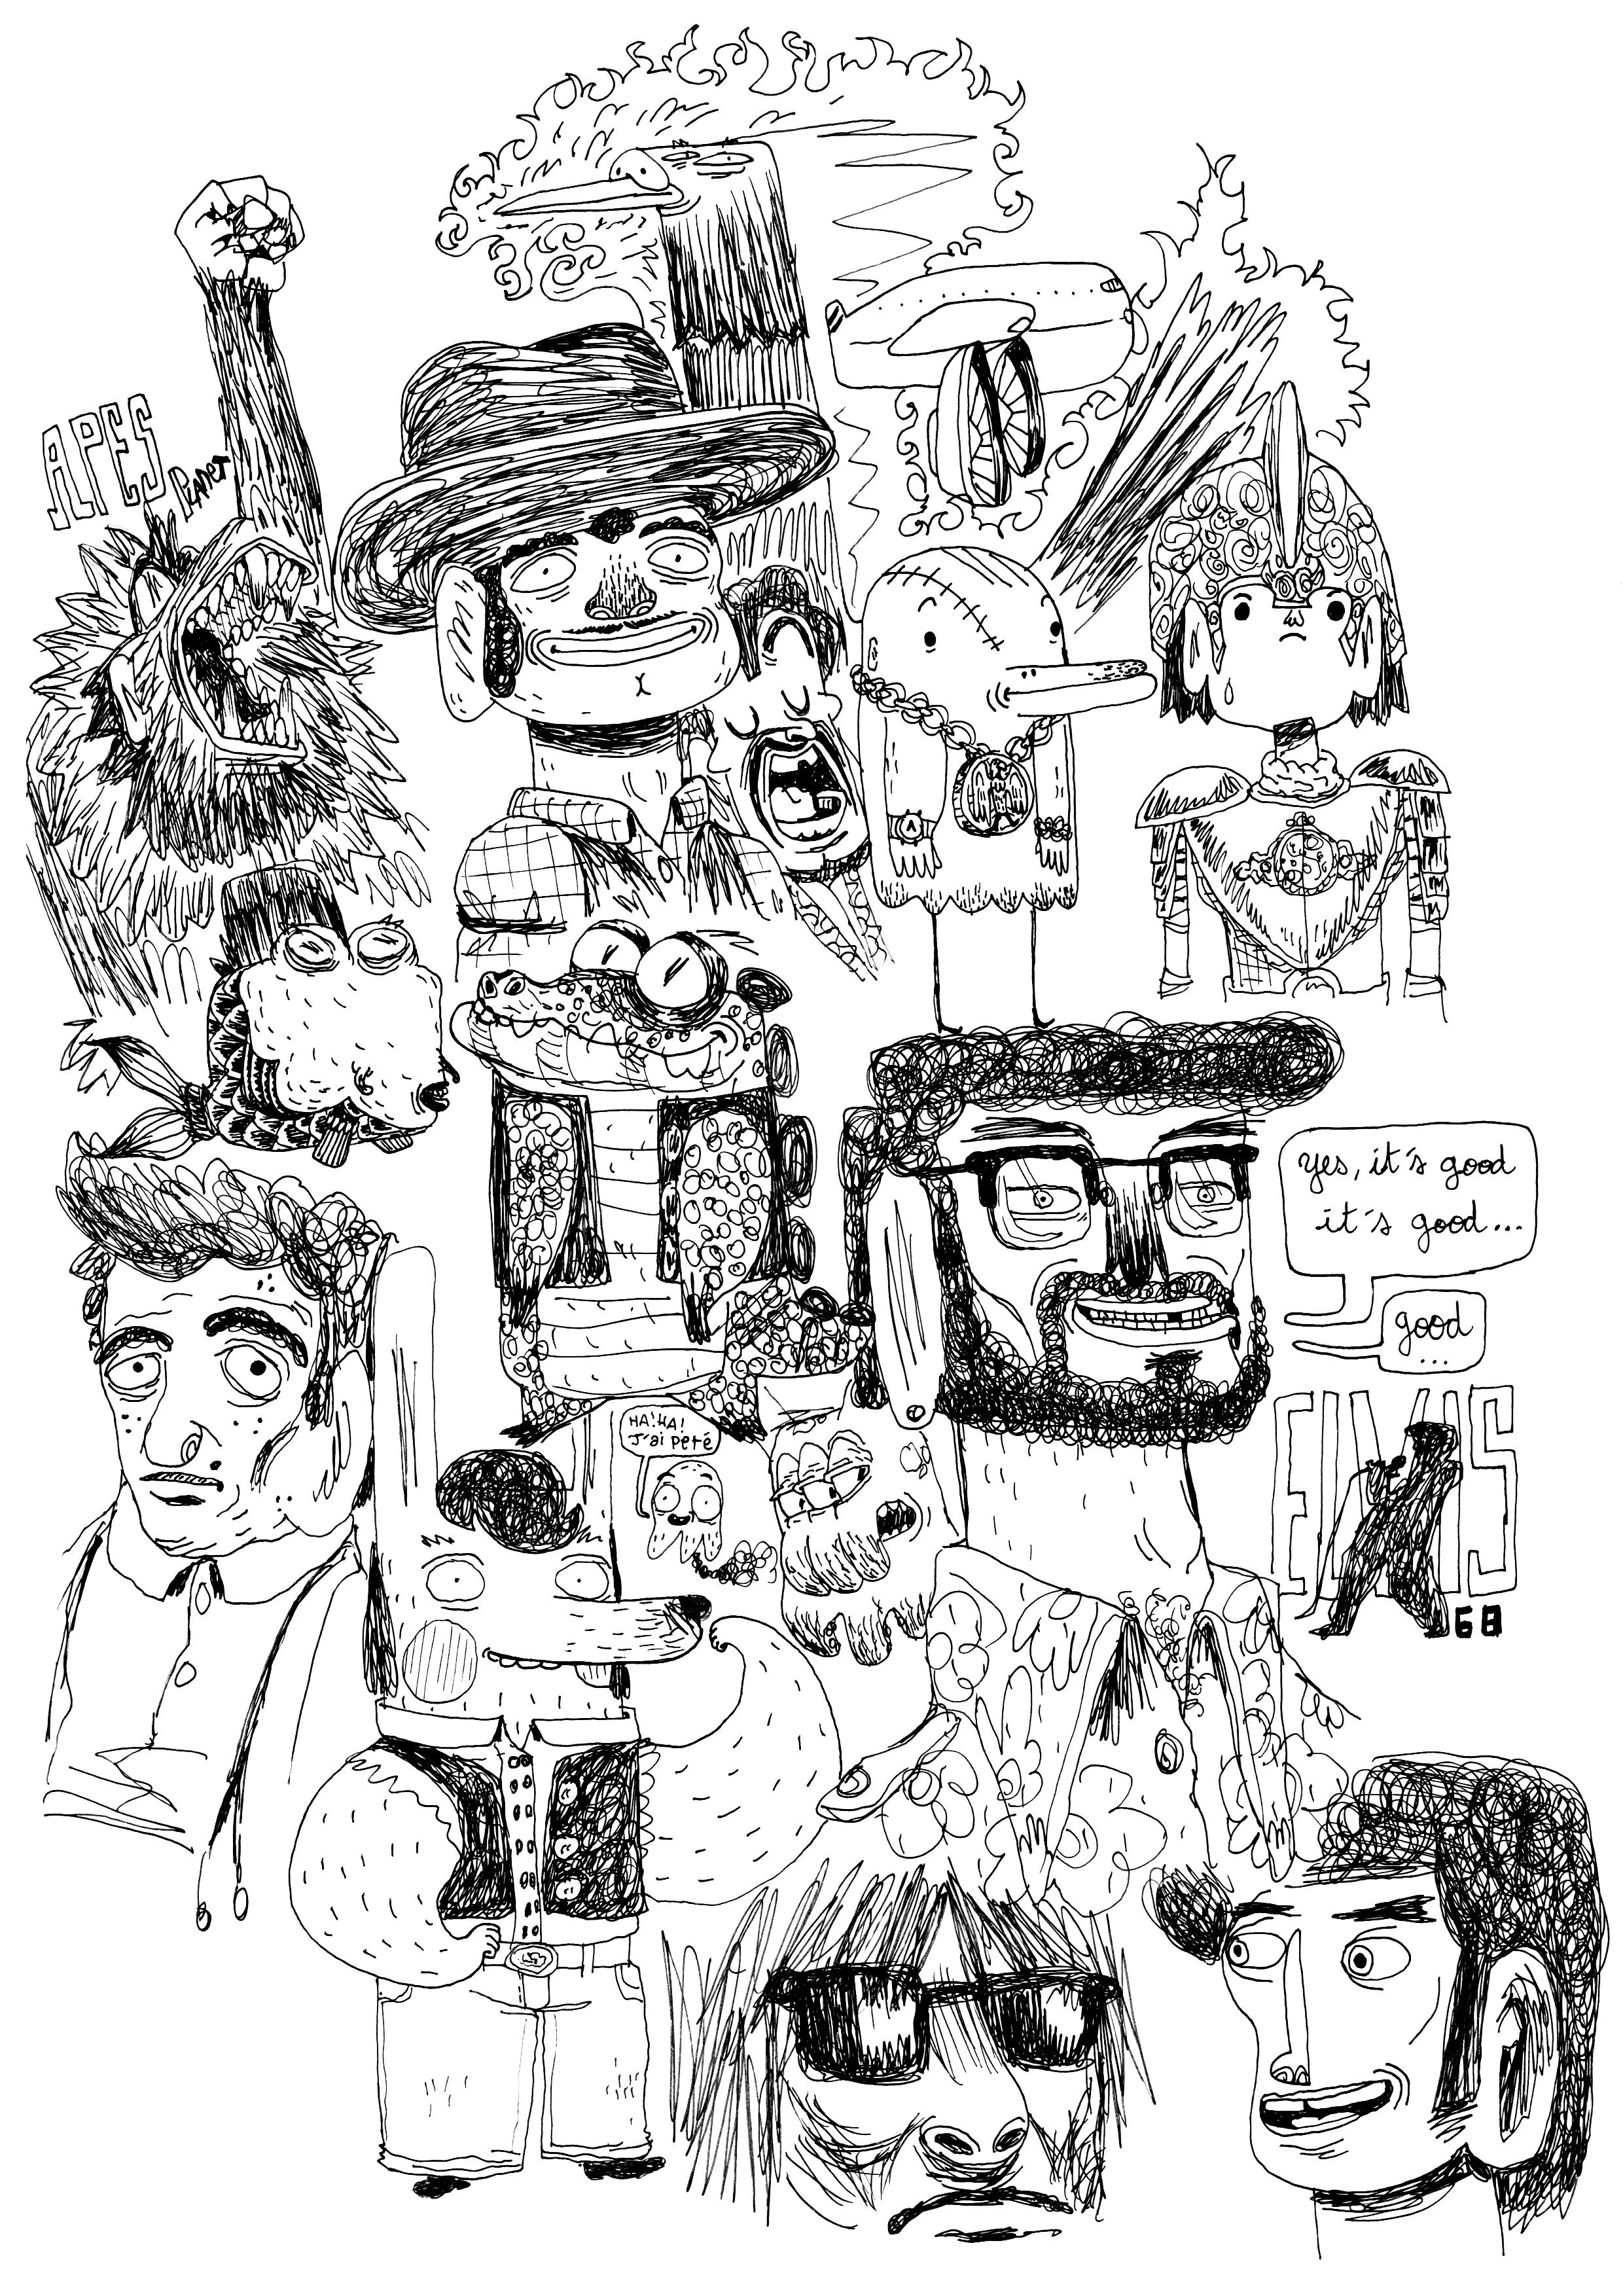 Pascal_Zaffiro_Doodle_28.jpg